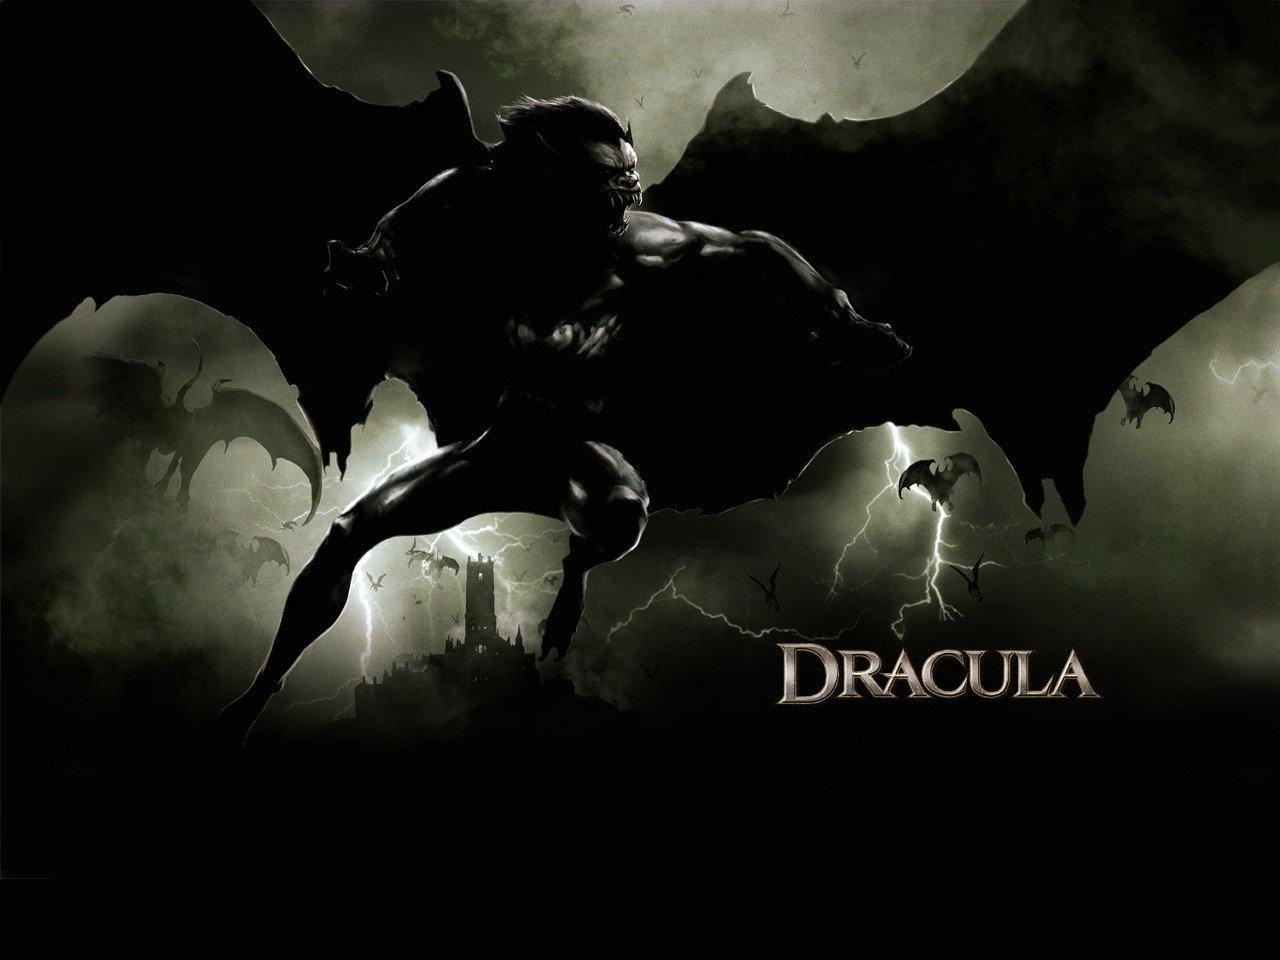 Fondos de vampiros Dracula_wallpapers_fondos_04